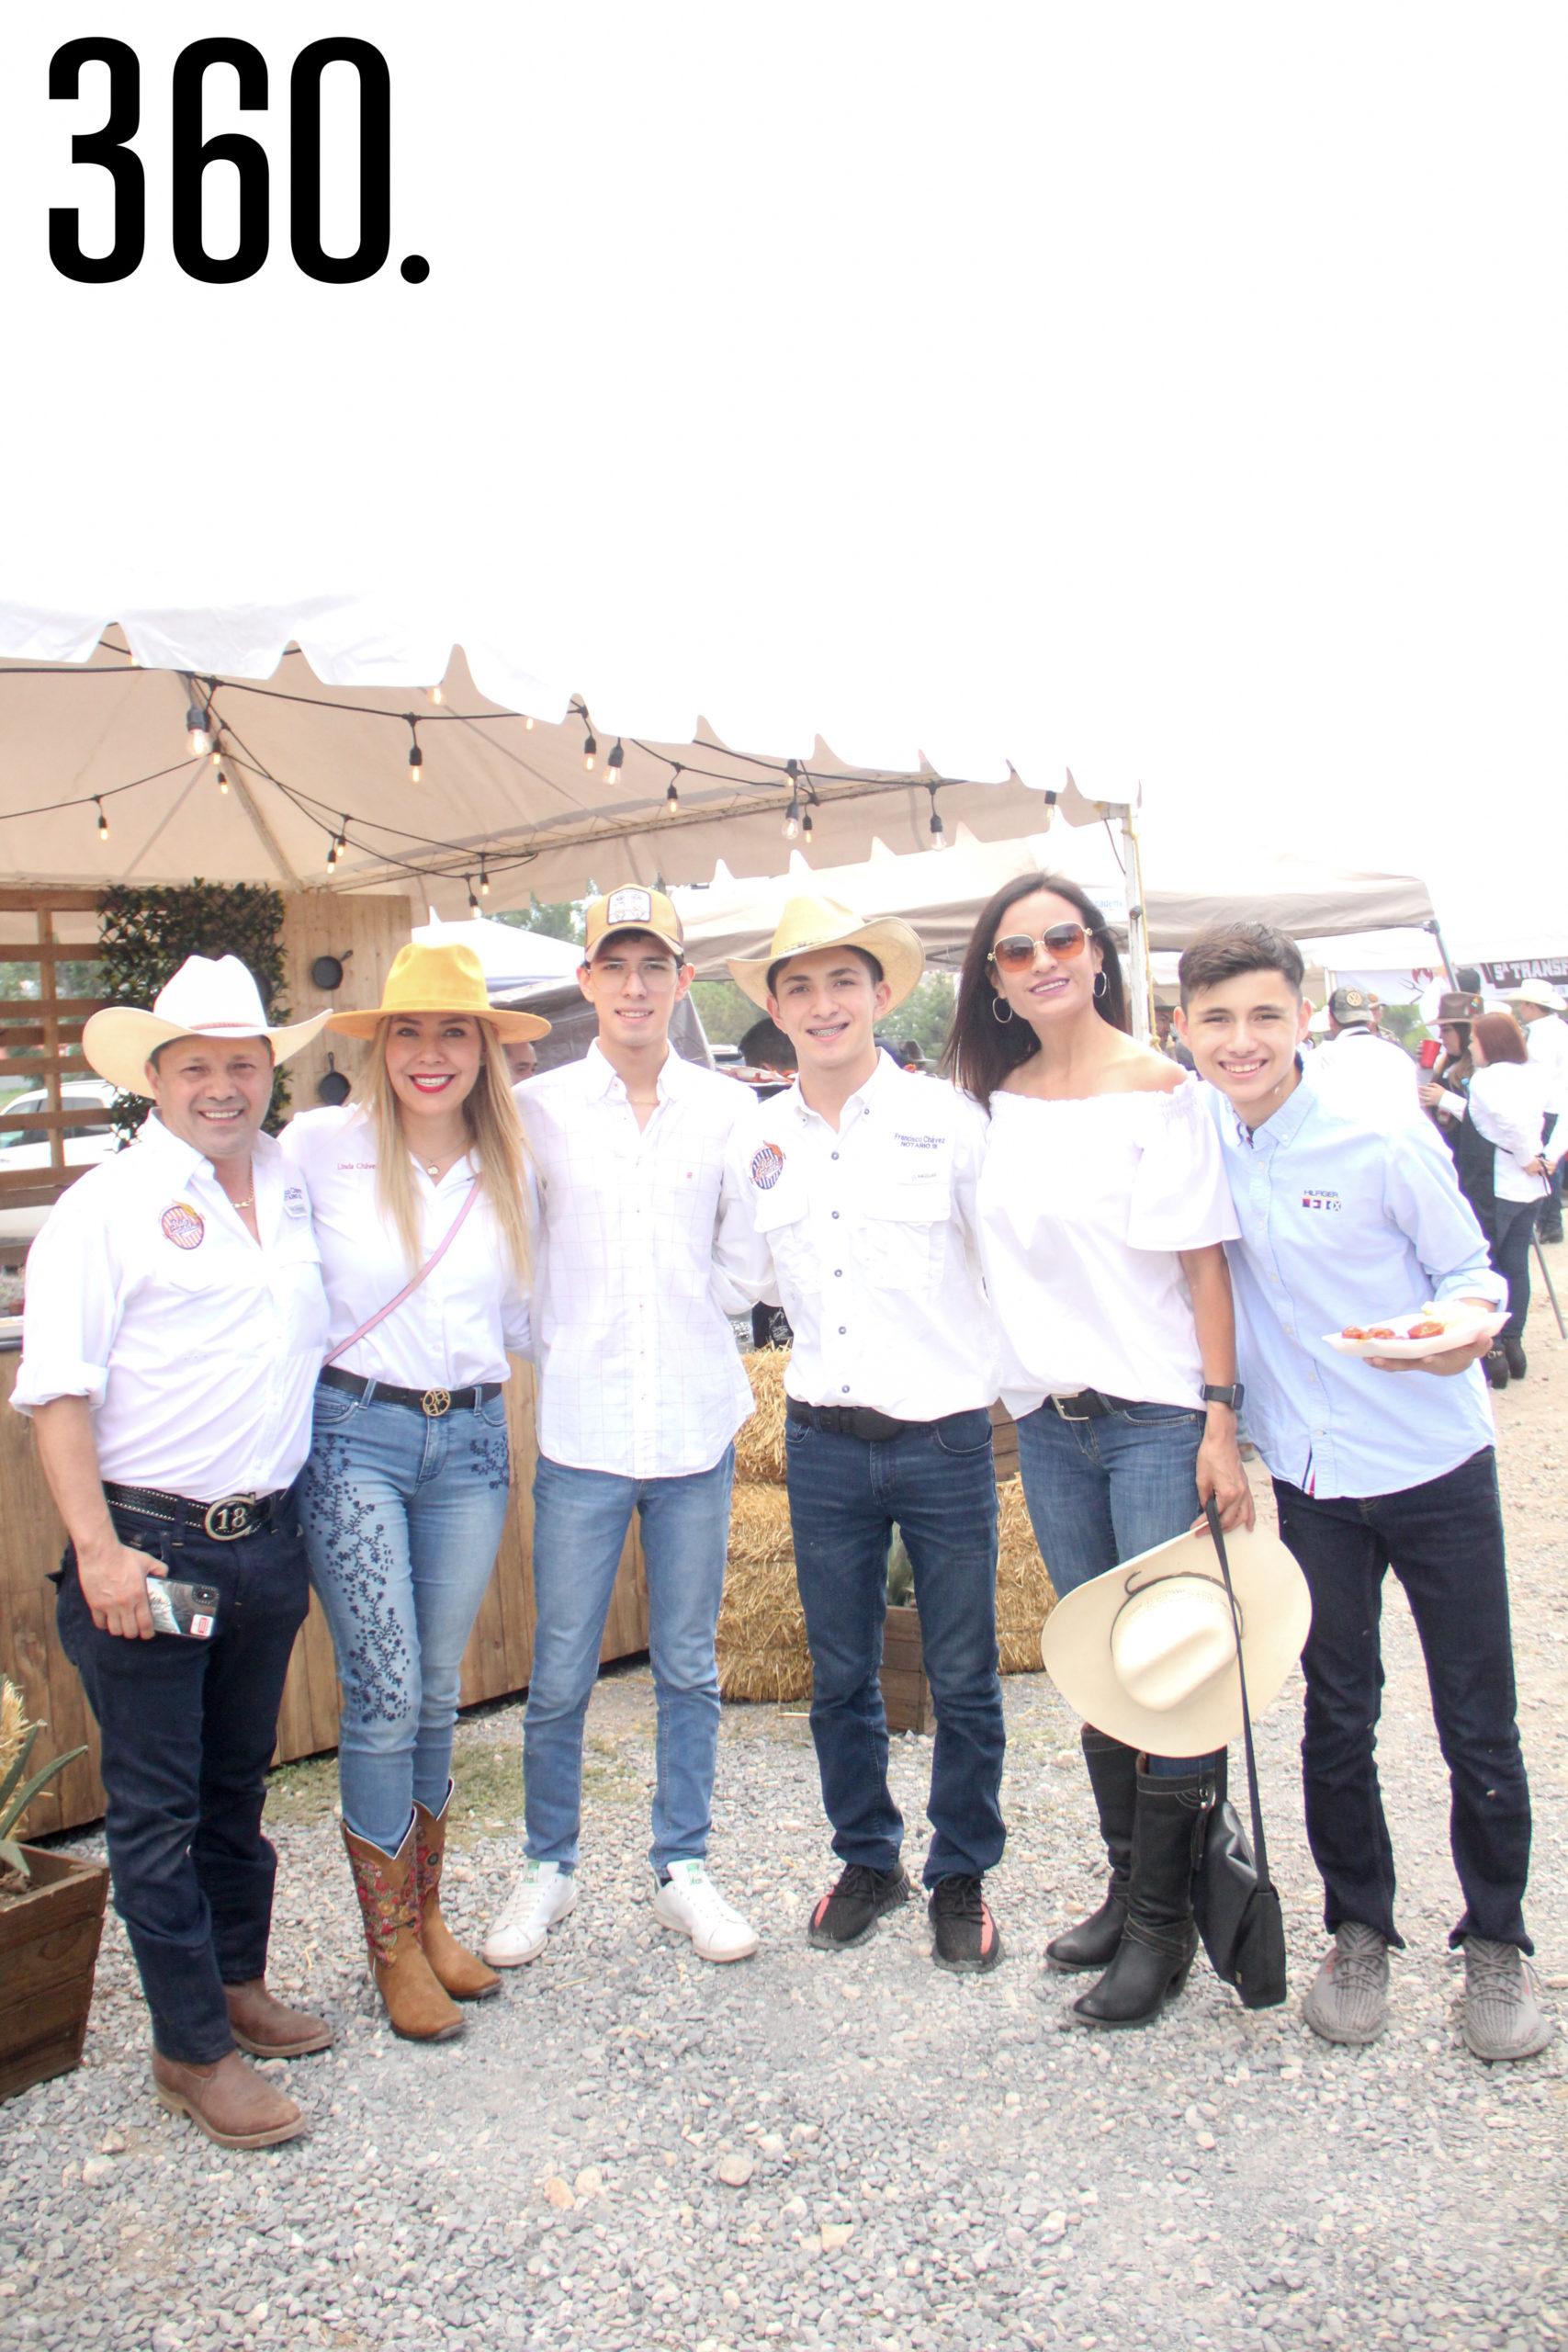 Paco Chávez, Linda Chávez, Paco Chávez, Chuy Chávez, Anilú Zertuche y José Chávez.